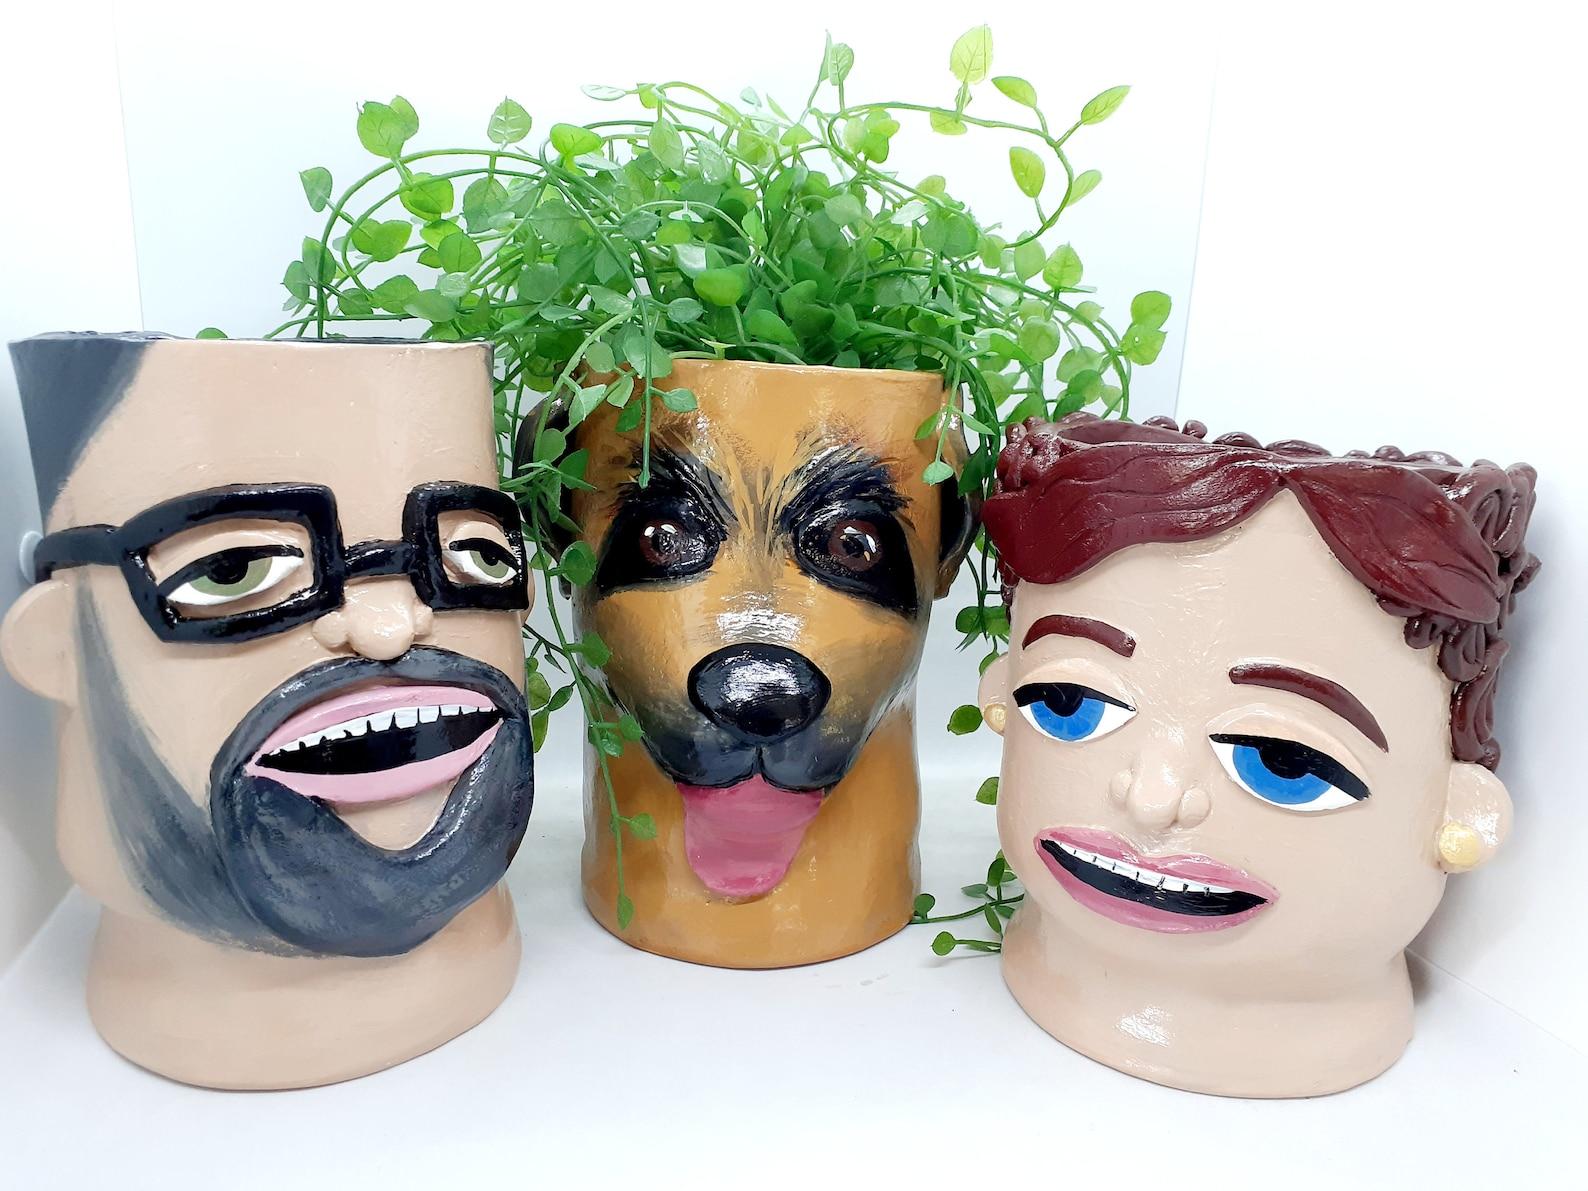 Lookalike planters